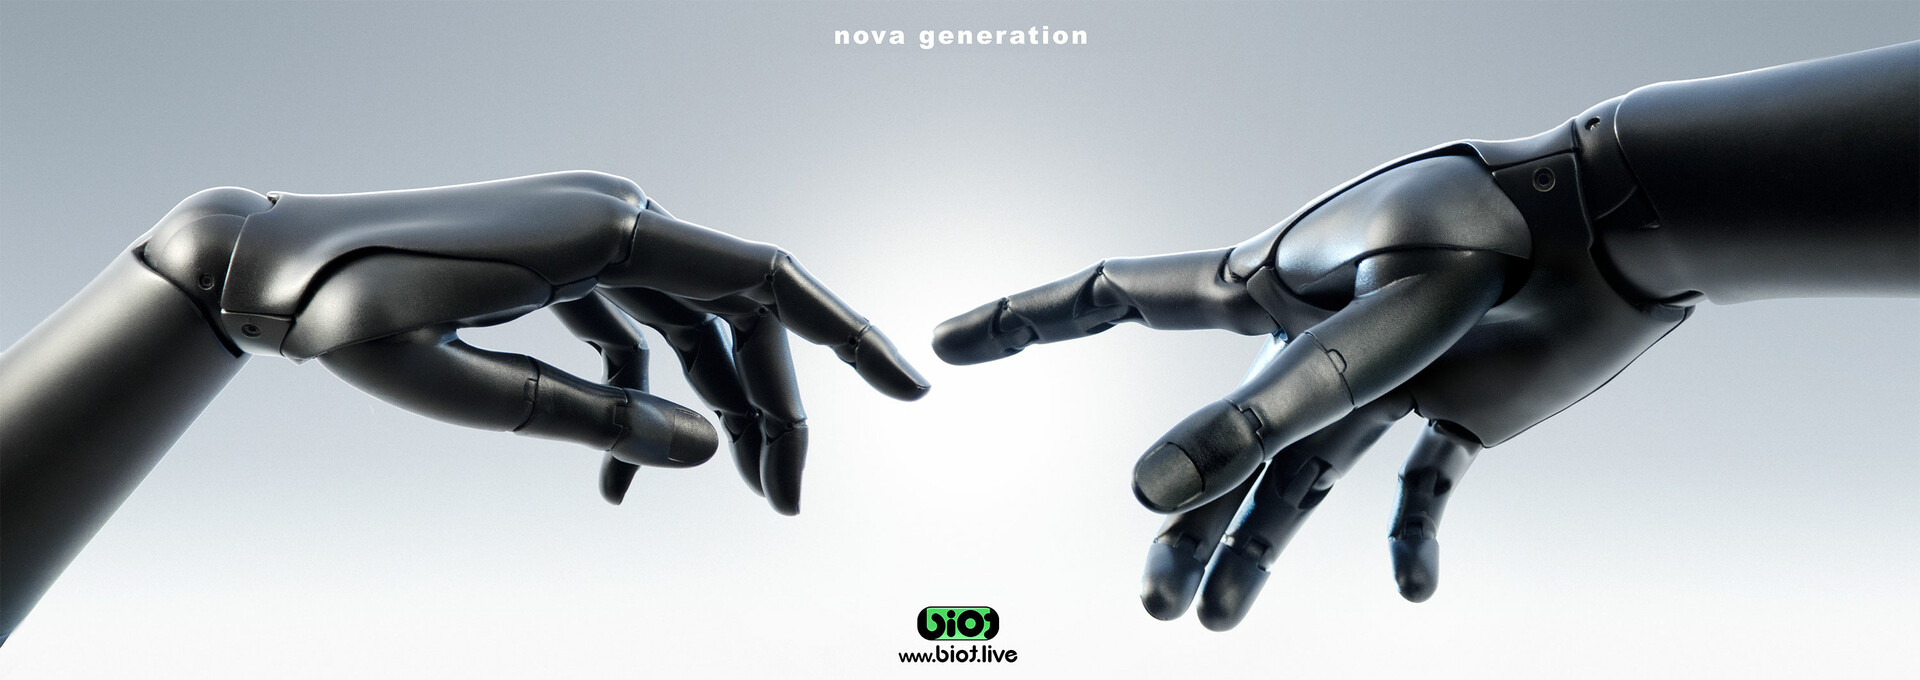 Novo Generation AI